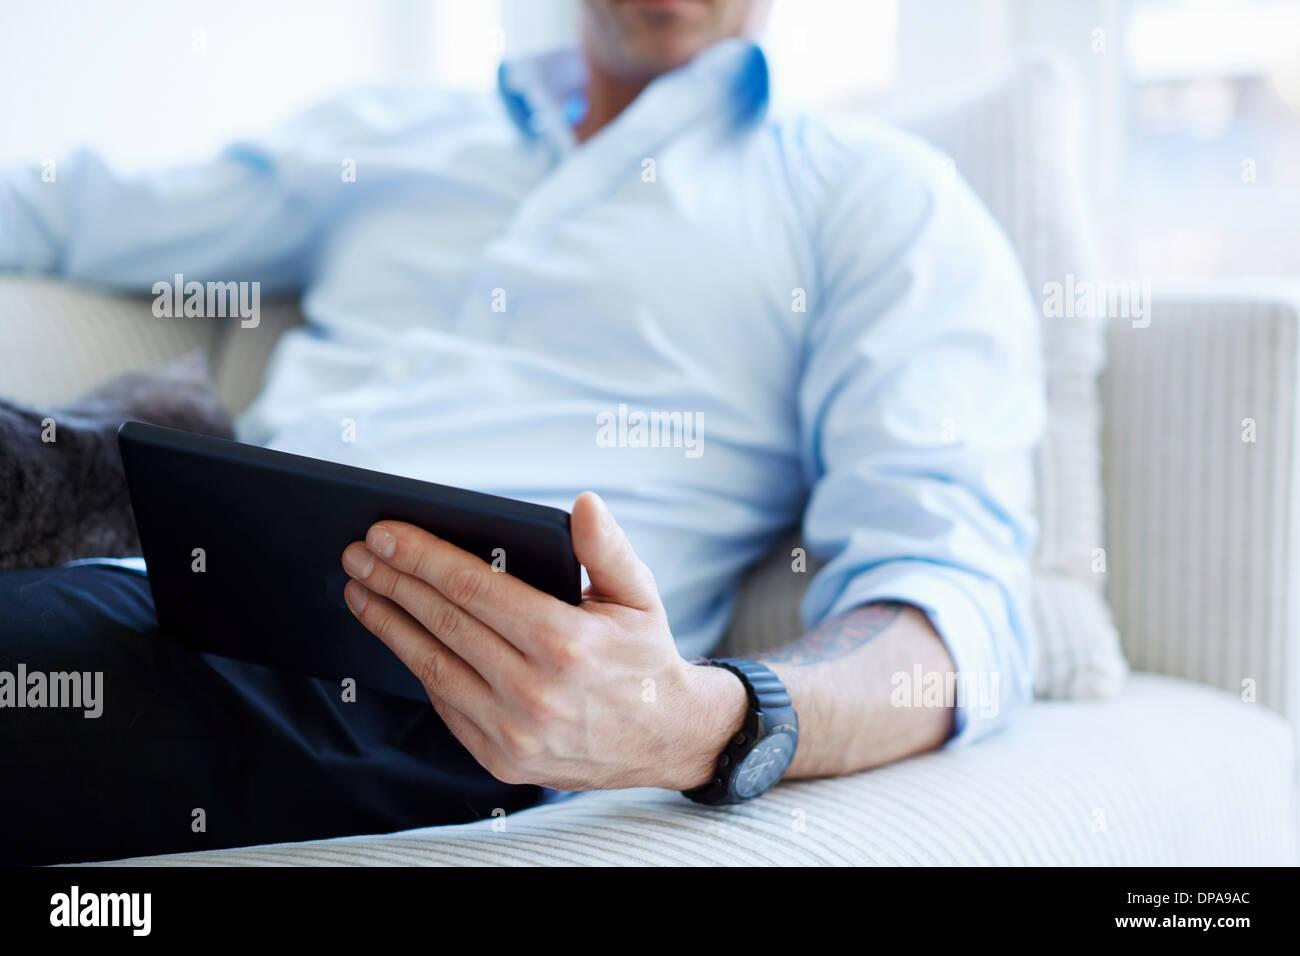 Schuss des Mannes Mittelteil hält digitale Tablet beschnitten Stockbild